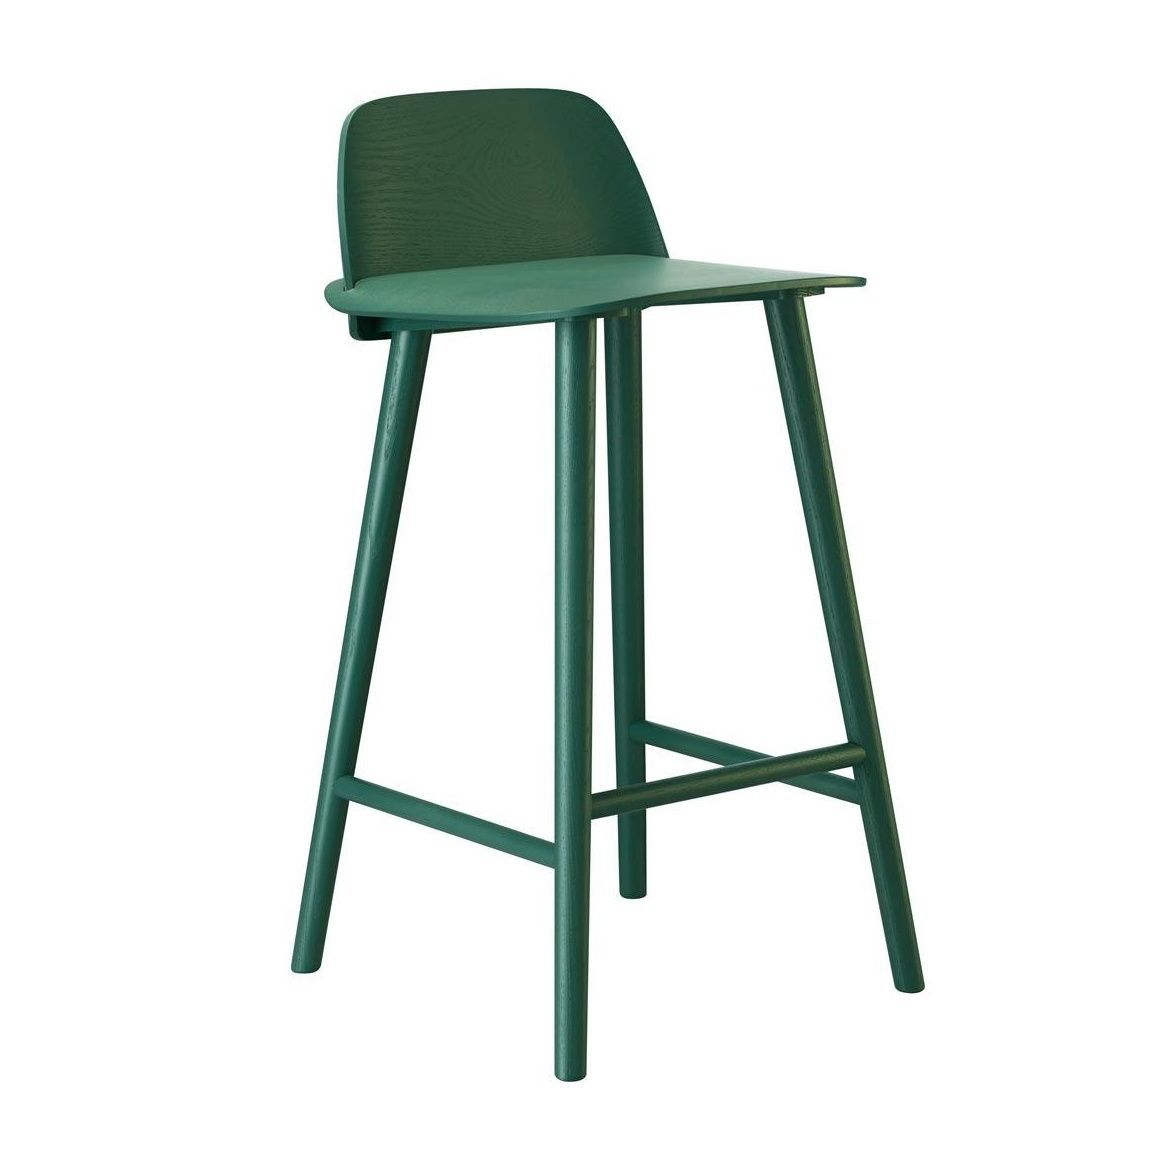 muuto nerd bar stool 65 muuto. Black Bedroom Furniture Sets. Home Design Ideas